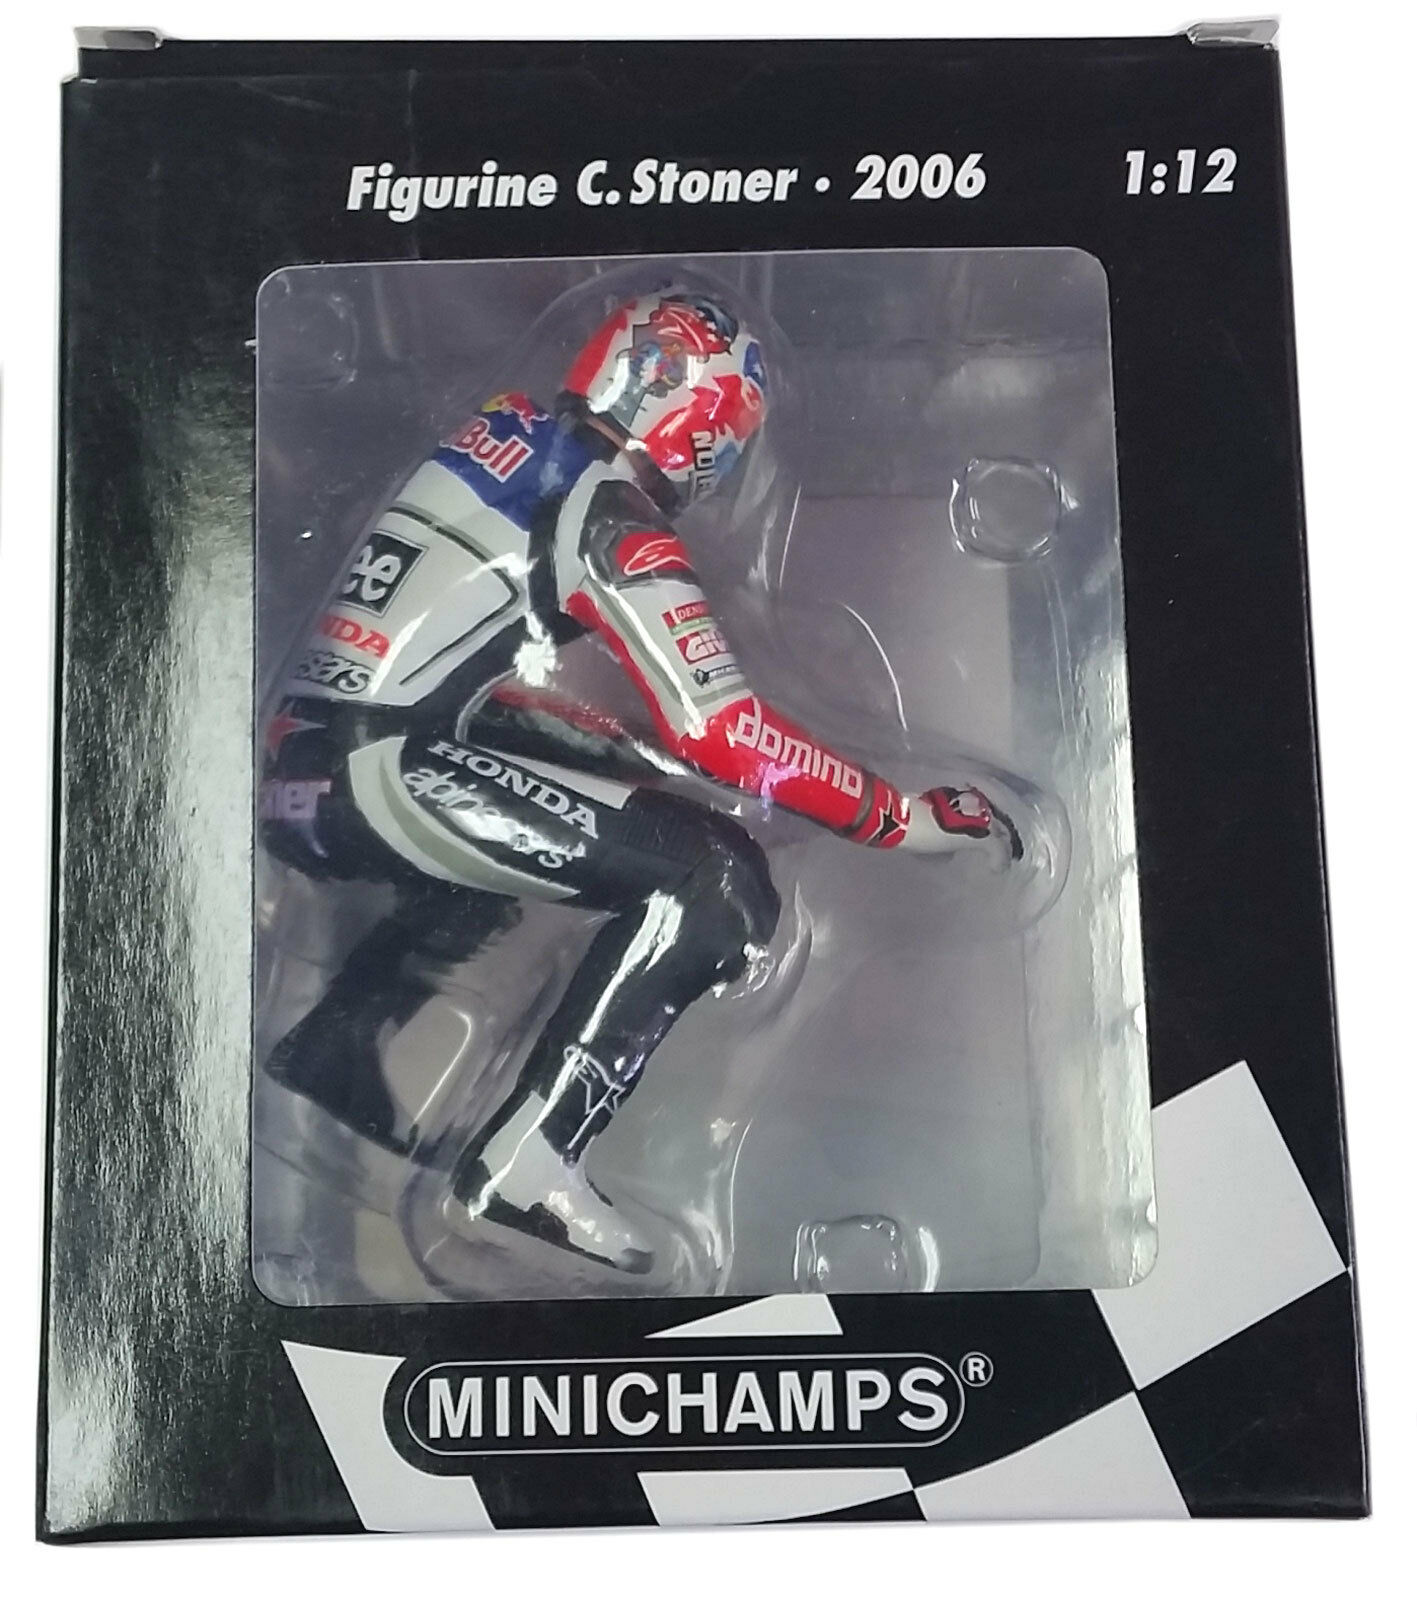 MINICHAMPS 1/12 2006 MOTOGP TEAM LCR HONDA CASEY STONER FIGURE SITTING 312060127